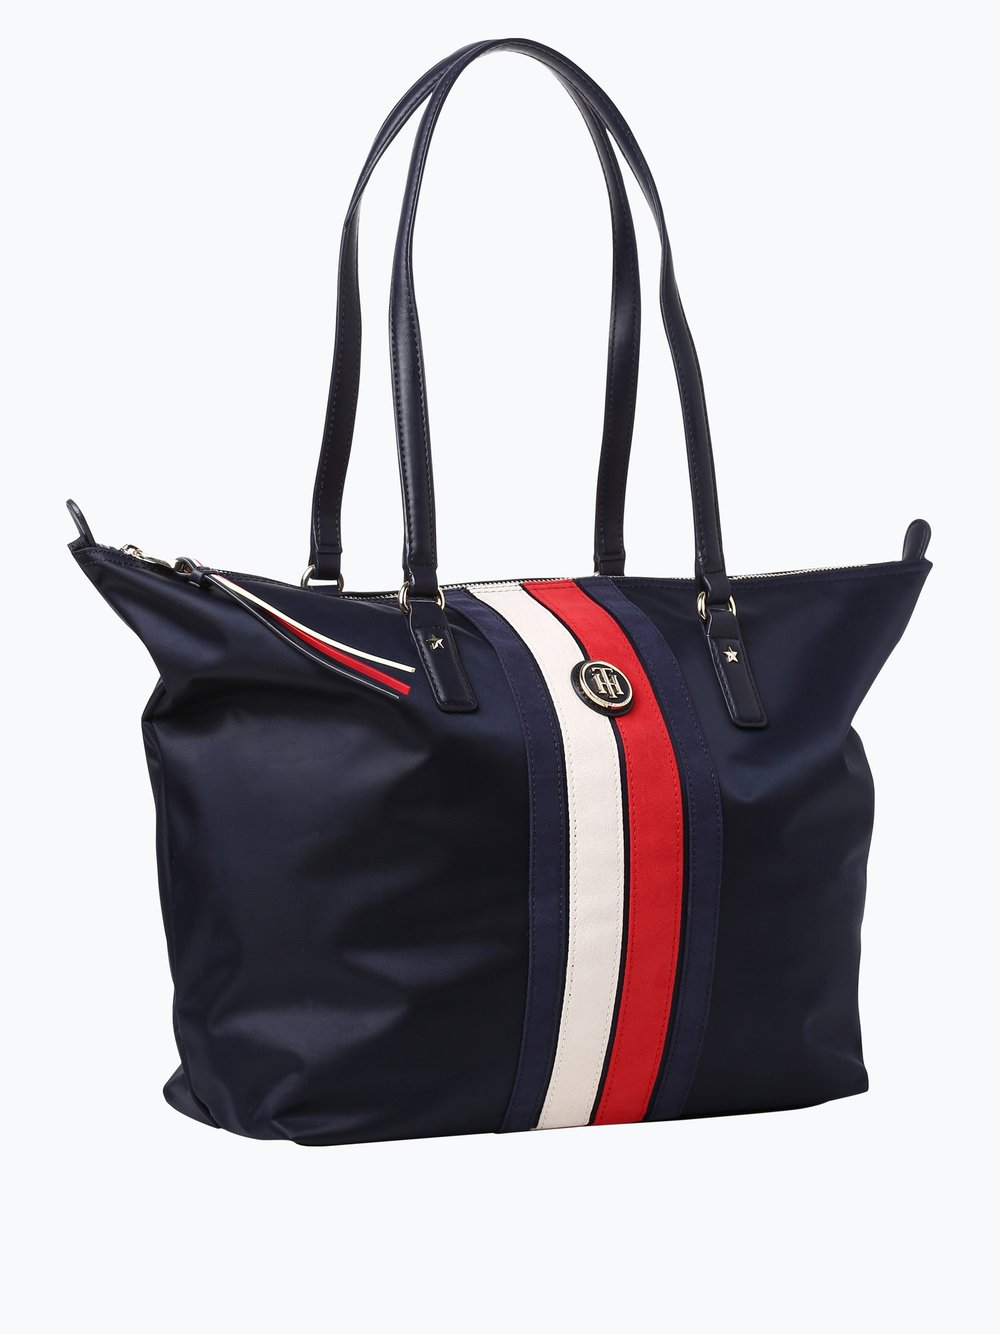 bcb7172ad5bf9 Tommy Hilfiger Damska torba shopper kup online